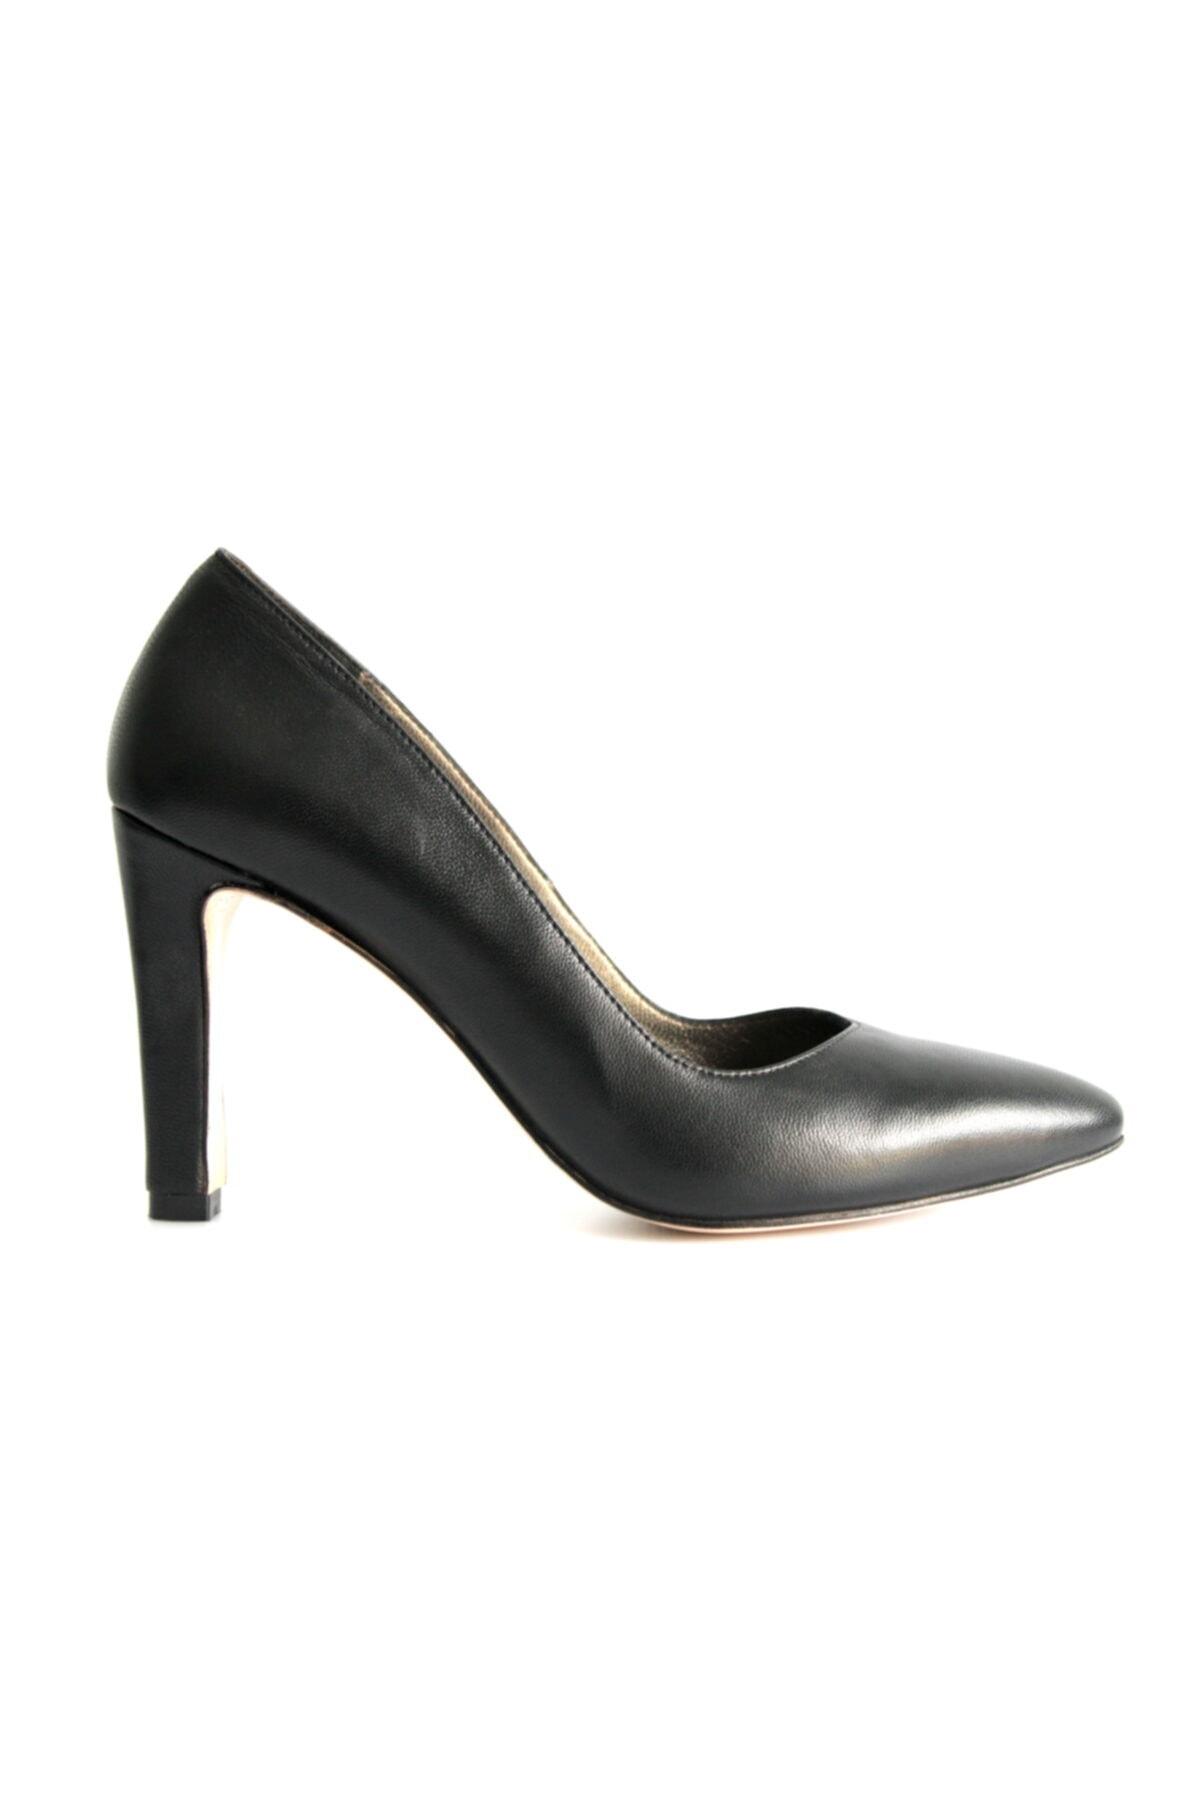 Beta Shoes Kadın Hakiki Deri Topuklu Ayakkabı Siyah 2